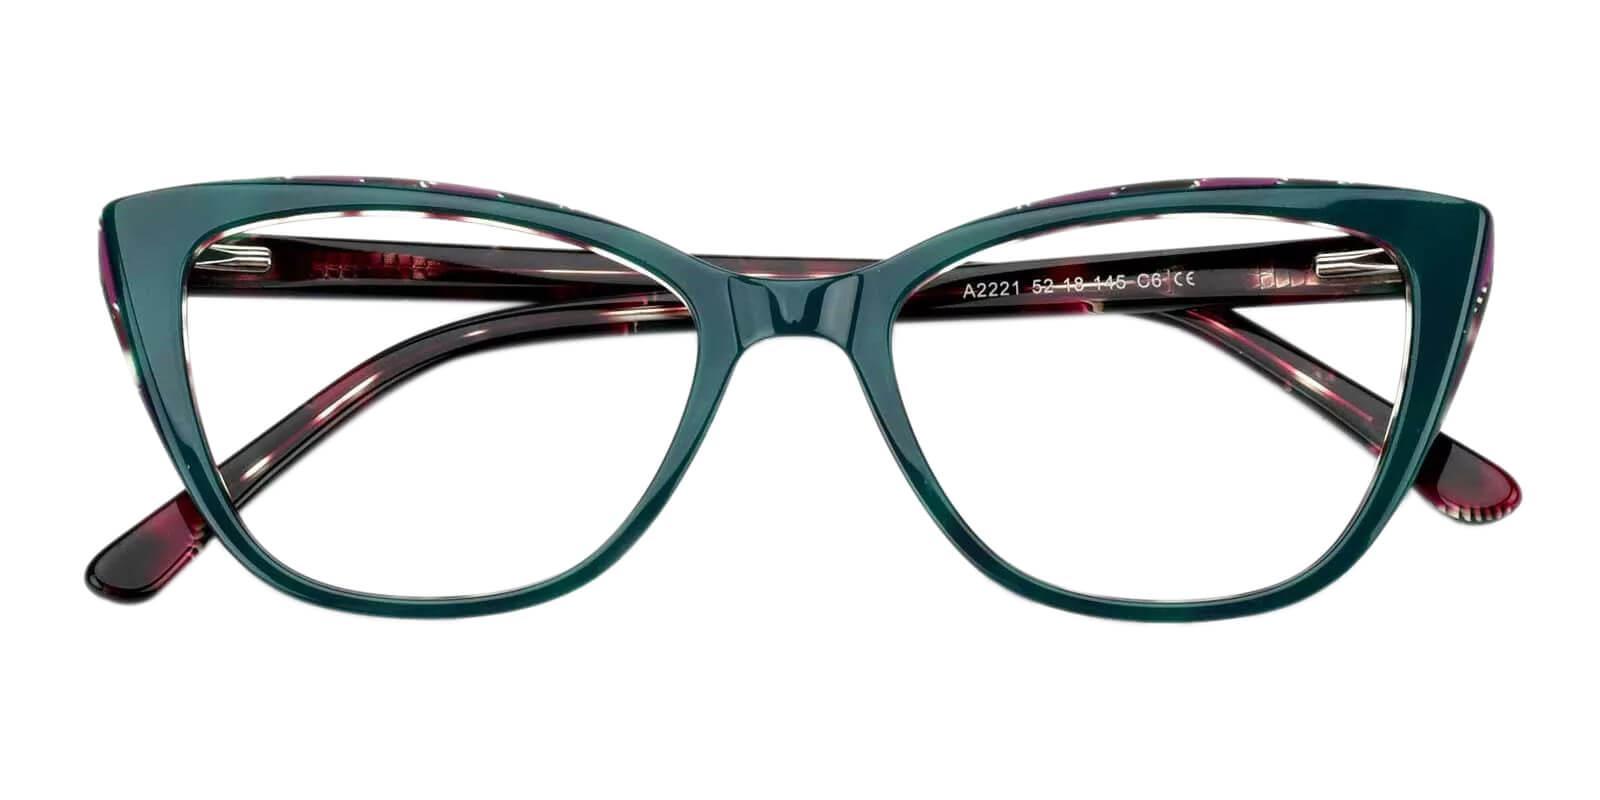 Teddy Green Acetate Eyeglasses , Fashion , SpringHinges , UniversalBridgeFit Frames from ABBE Glasses